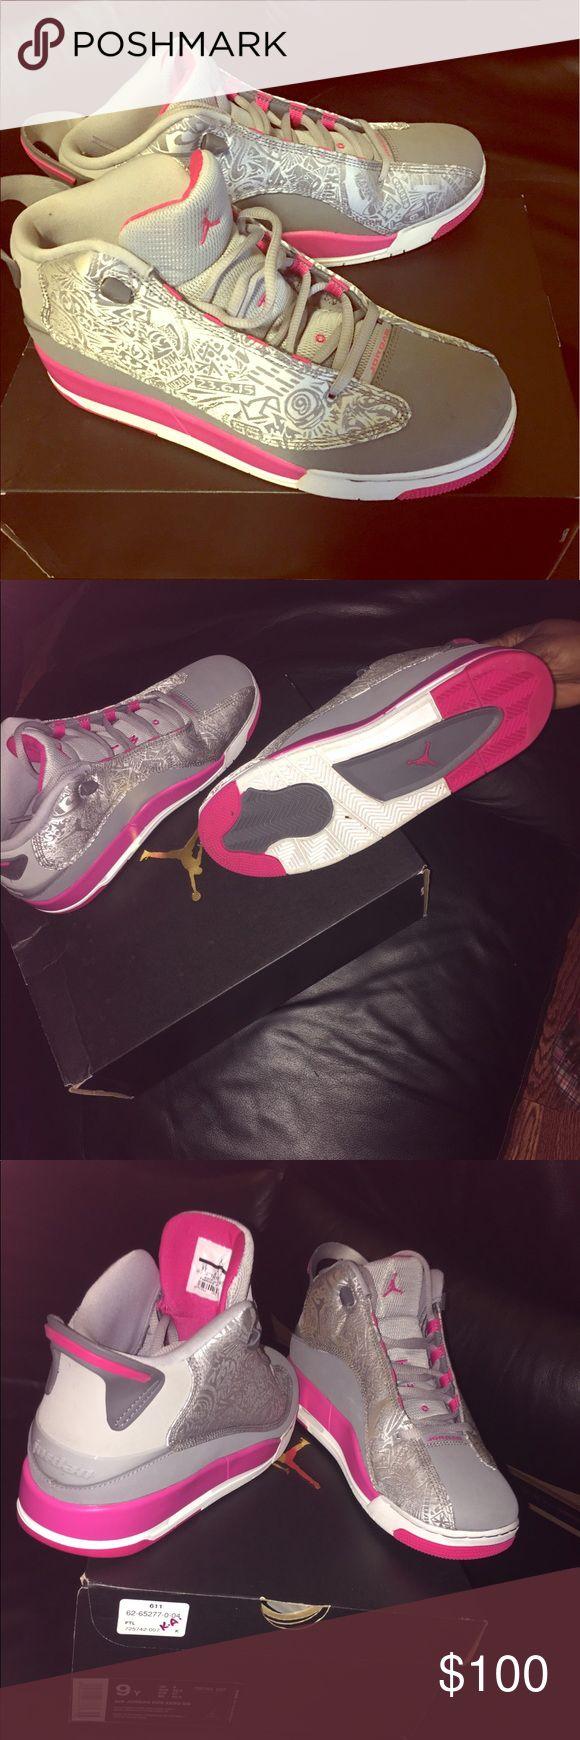 Air Jordan dub zero GG Brand New Jordans. Only wore once , missing insoles Air Jordan Shoes Sneakers